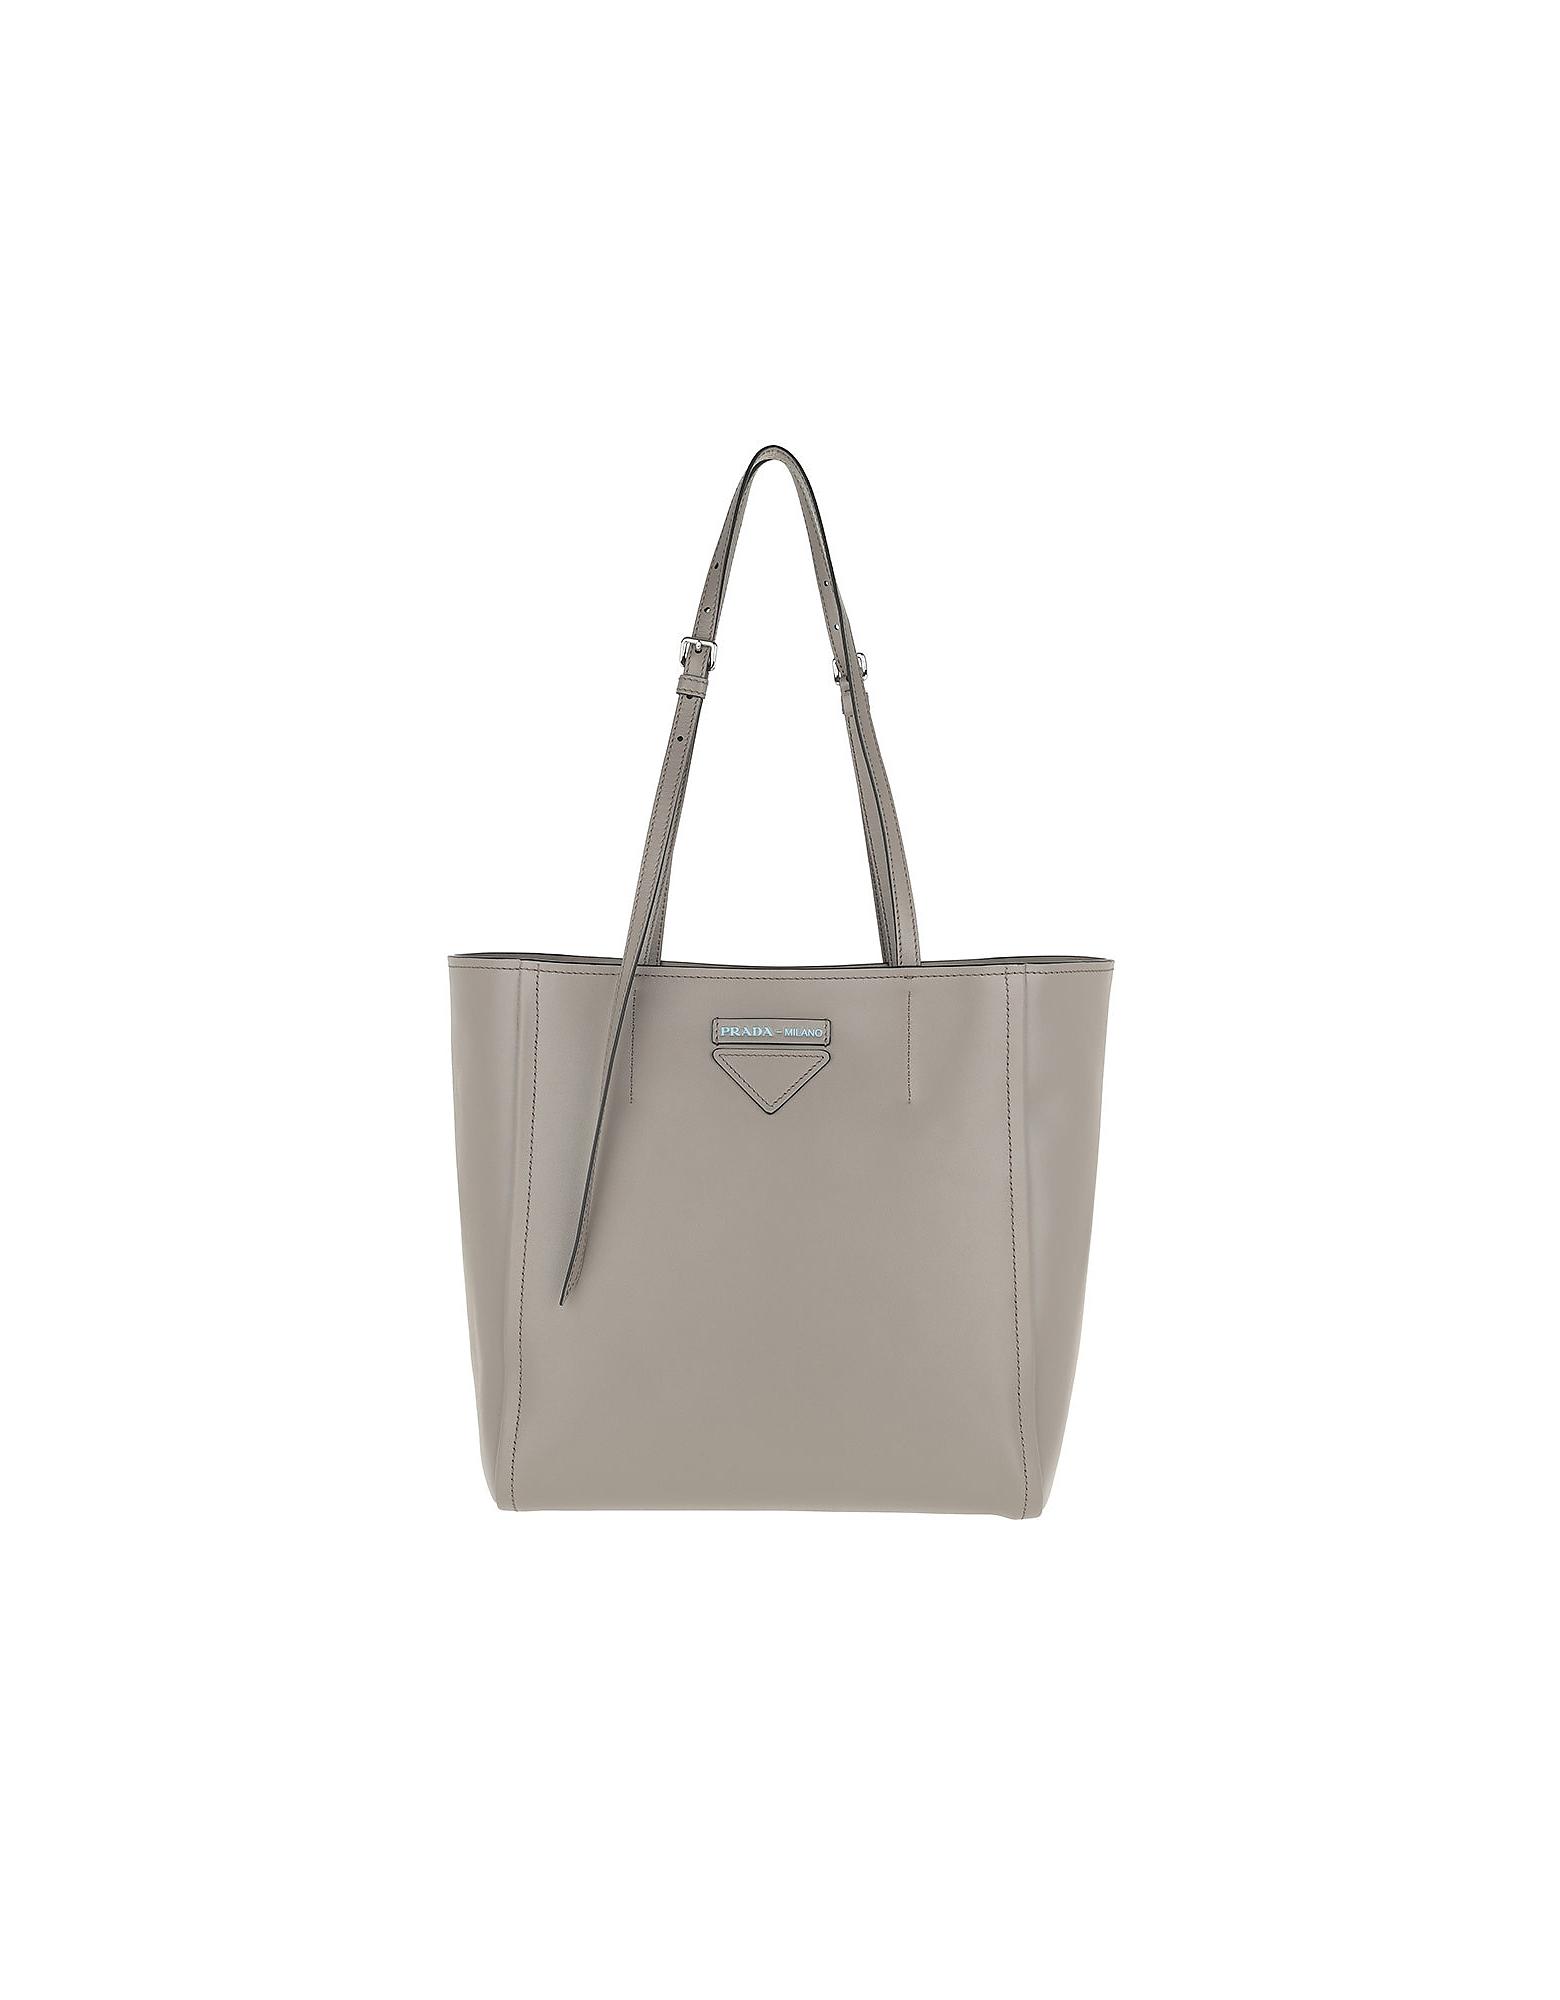 5a0a6b147a81 Prada Designer Handbags, Logo Tote Bag Rivets Leather Argilla/Nero (Luggage  & Bags